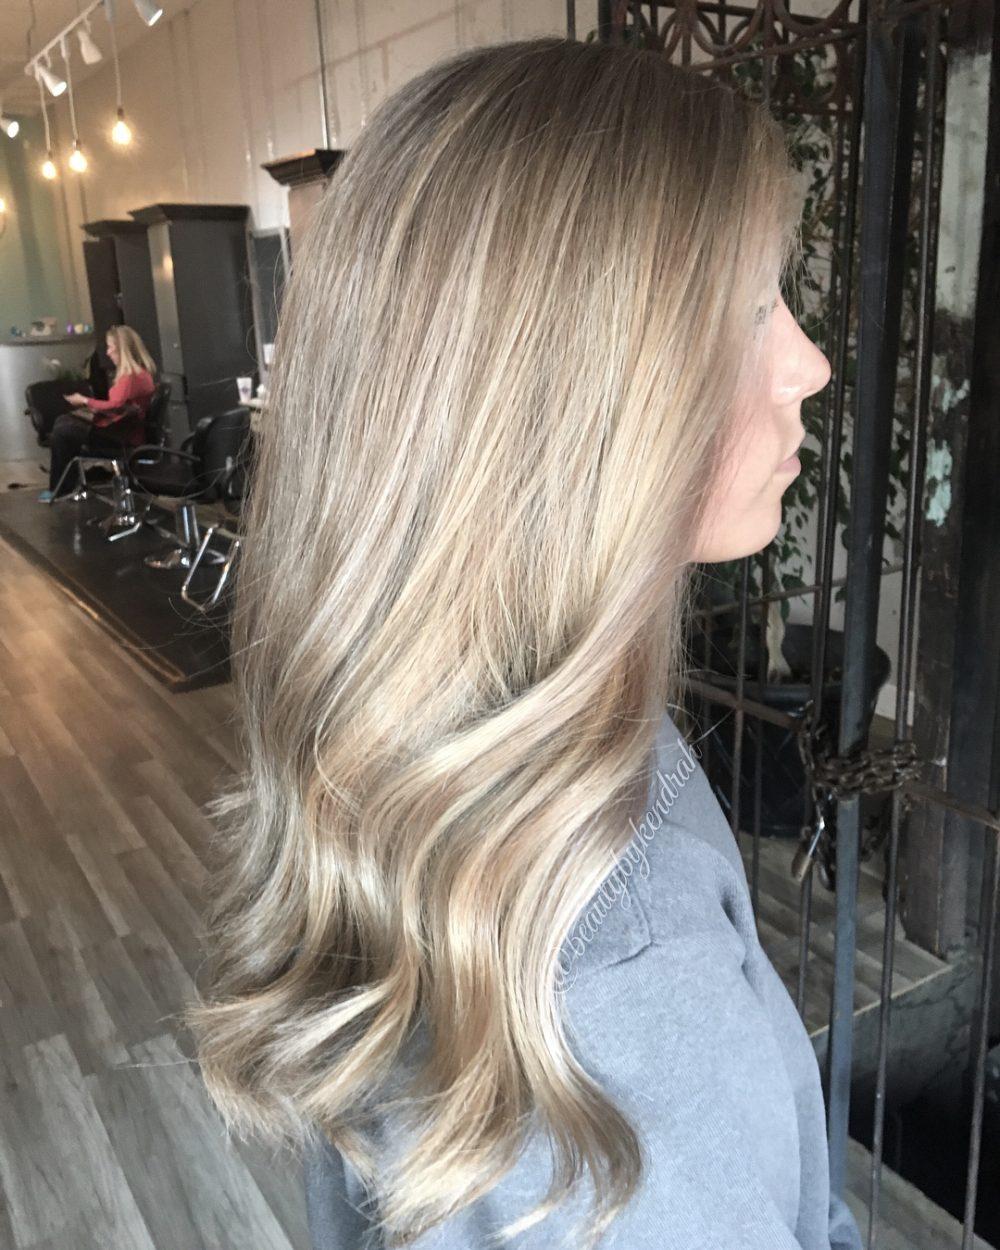 Neutral Ashy Blonde Balayage + Babylight hairstyle